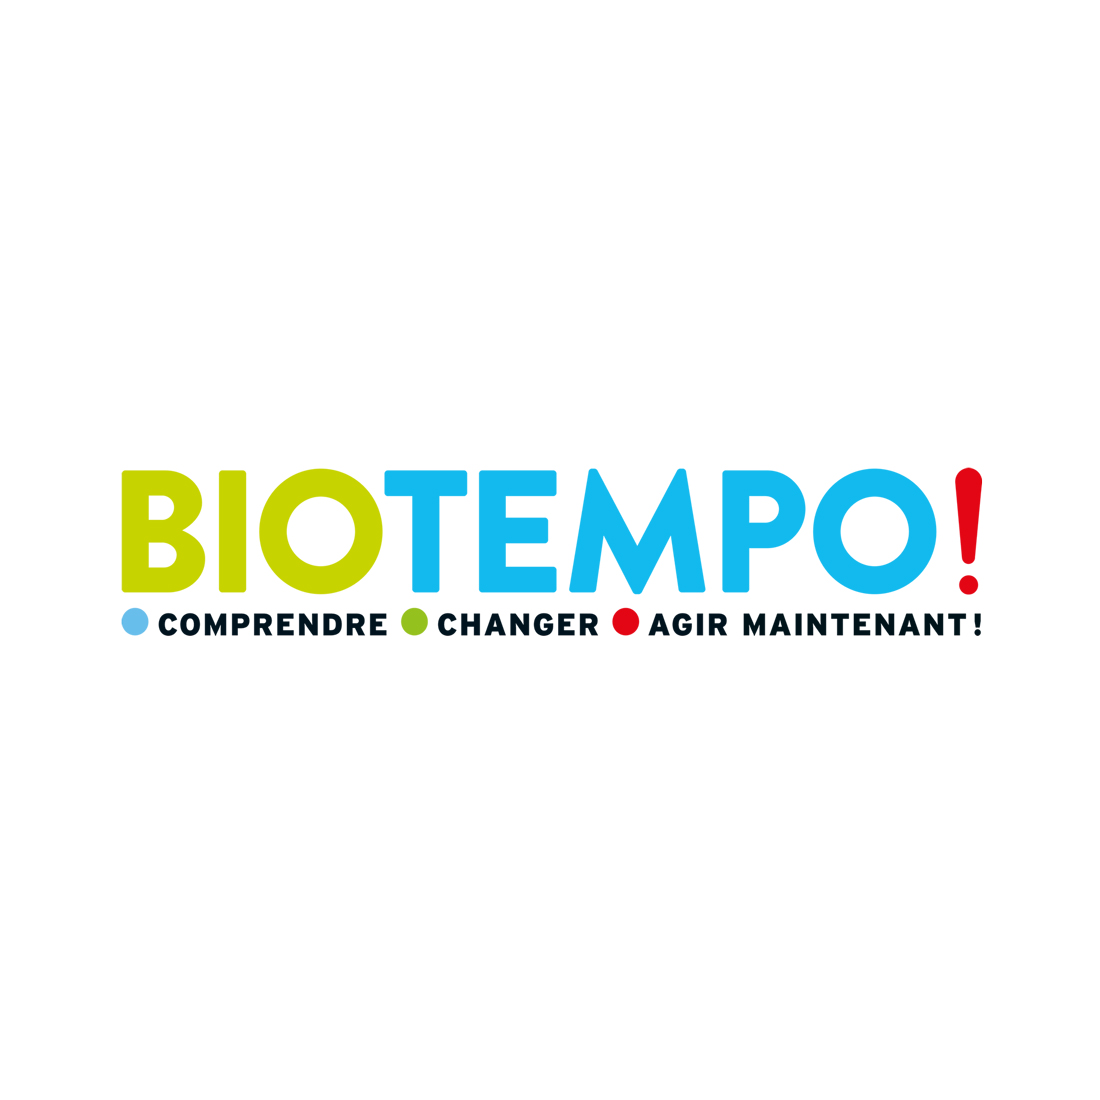 biotempo.jpg